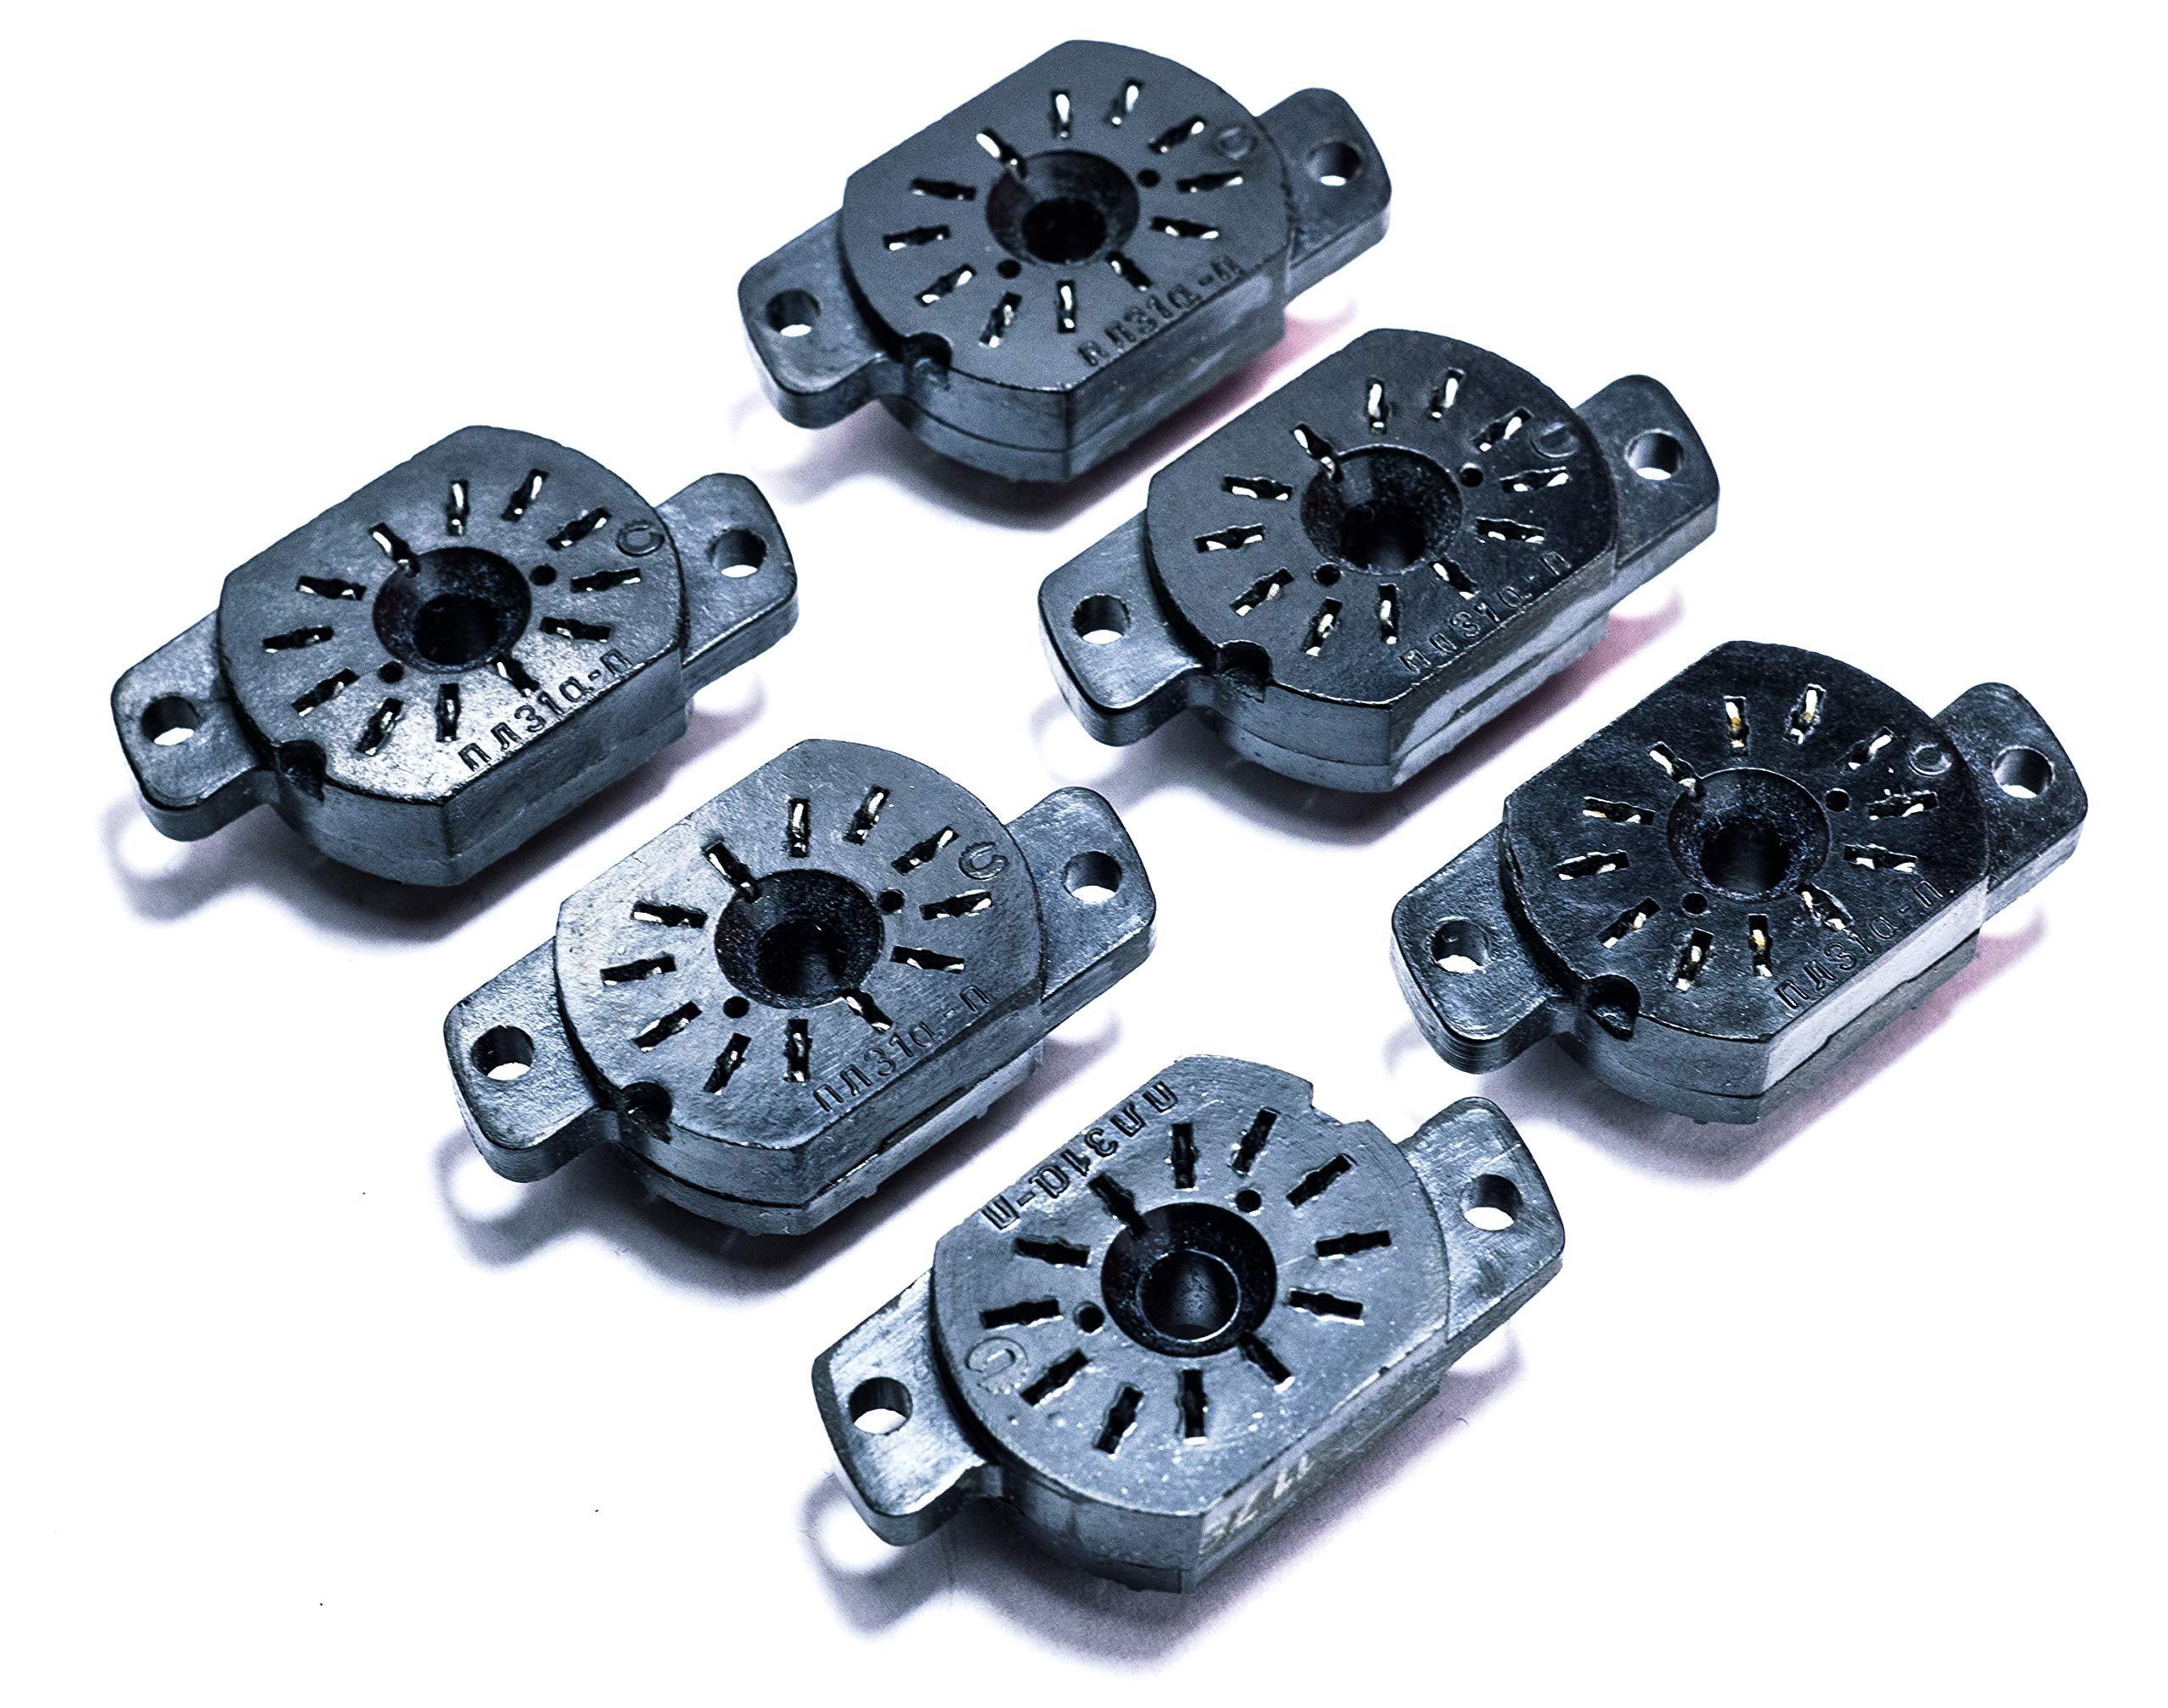 Socket for Nixie Tubes IN-12A, IN-12B, IN-15A, IN-15B, IV-22, New 6 pcs